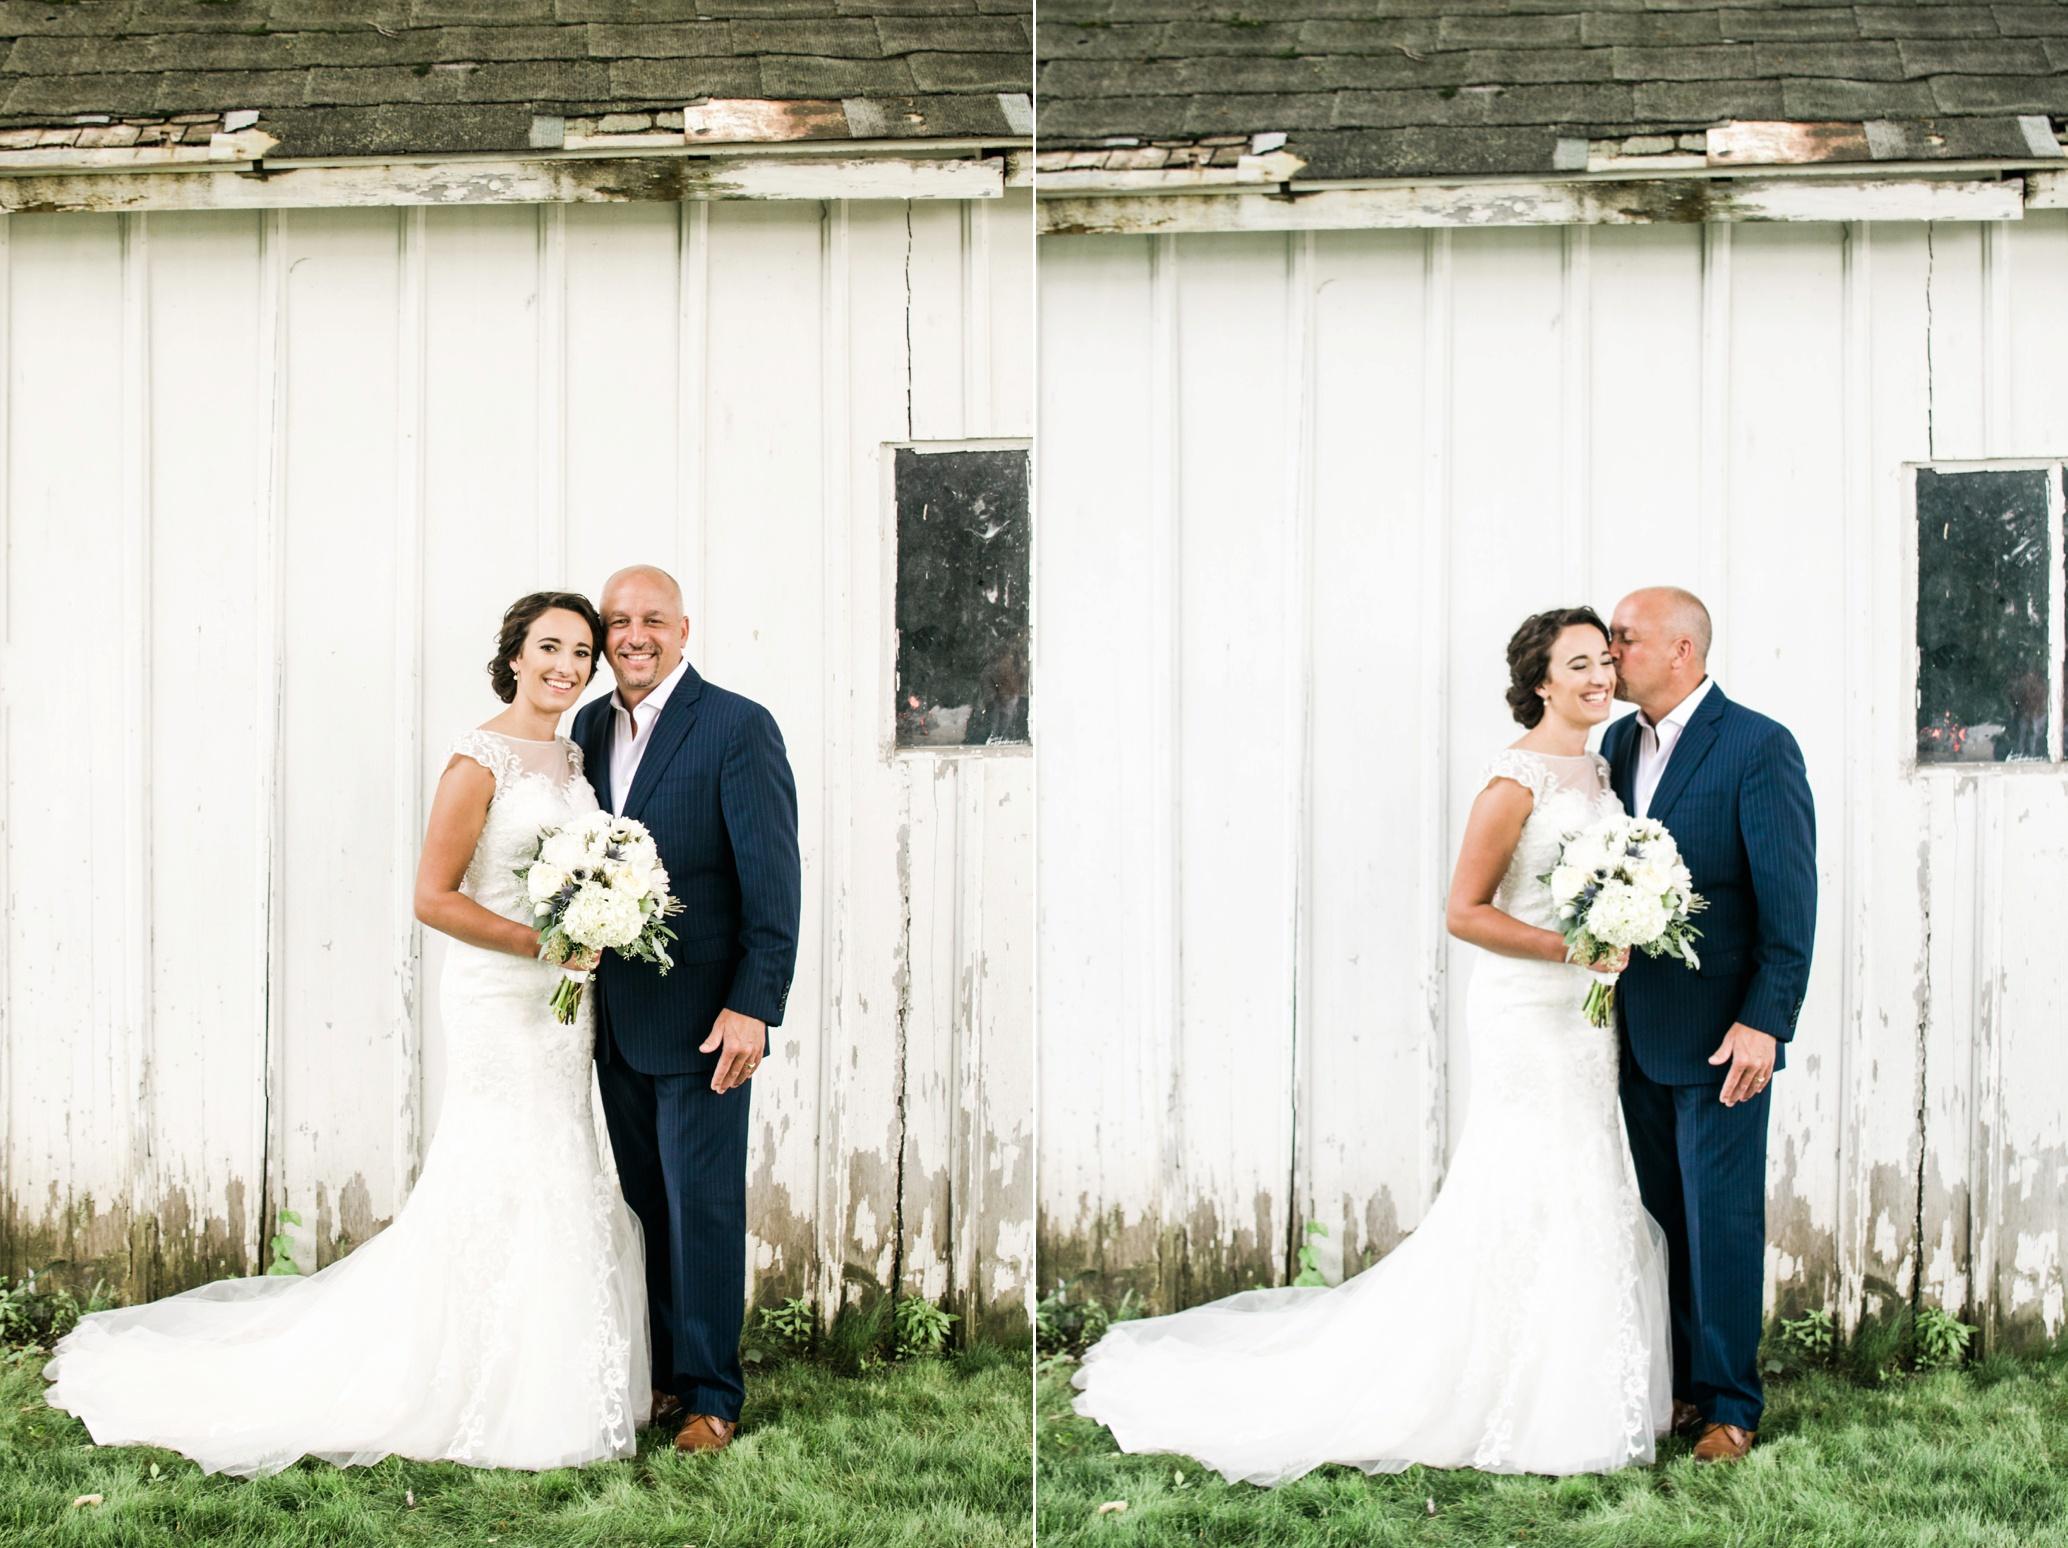 Palmer House and Stable Solon, IA | Ali Leigh Photo Minneapolis Wedding Photographer_0258.jpg